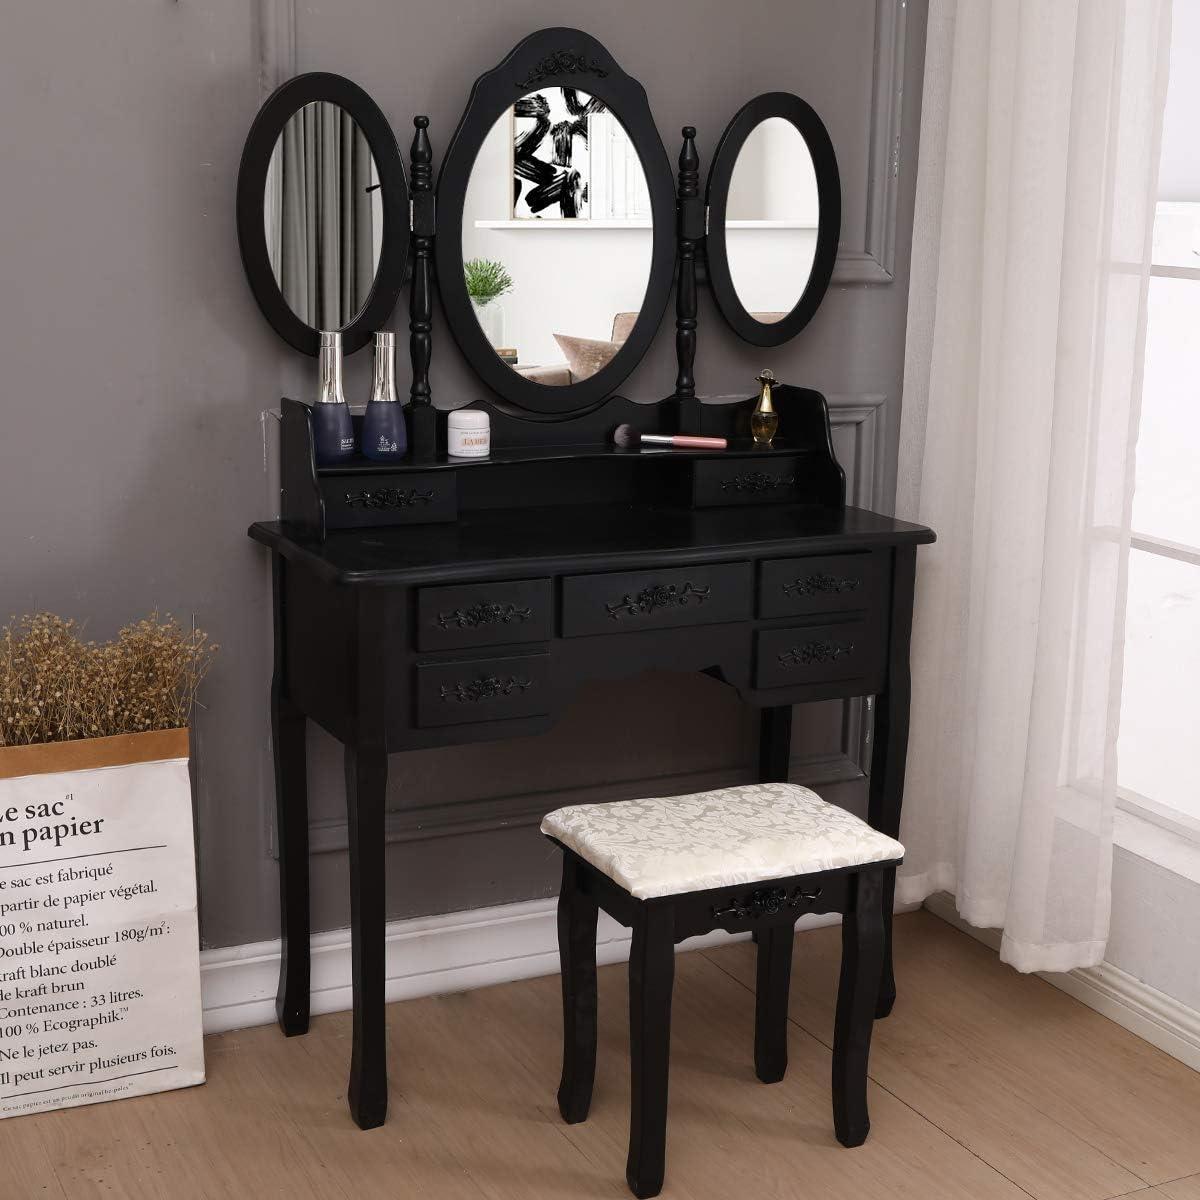 VNAURRY Vanity Set Tri Folding Dressing Table,7 Drawers,Oval Mirror Wood Bathroom Makeup Table Set with Cushioned Stool,Black